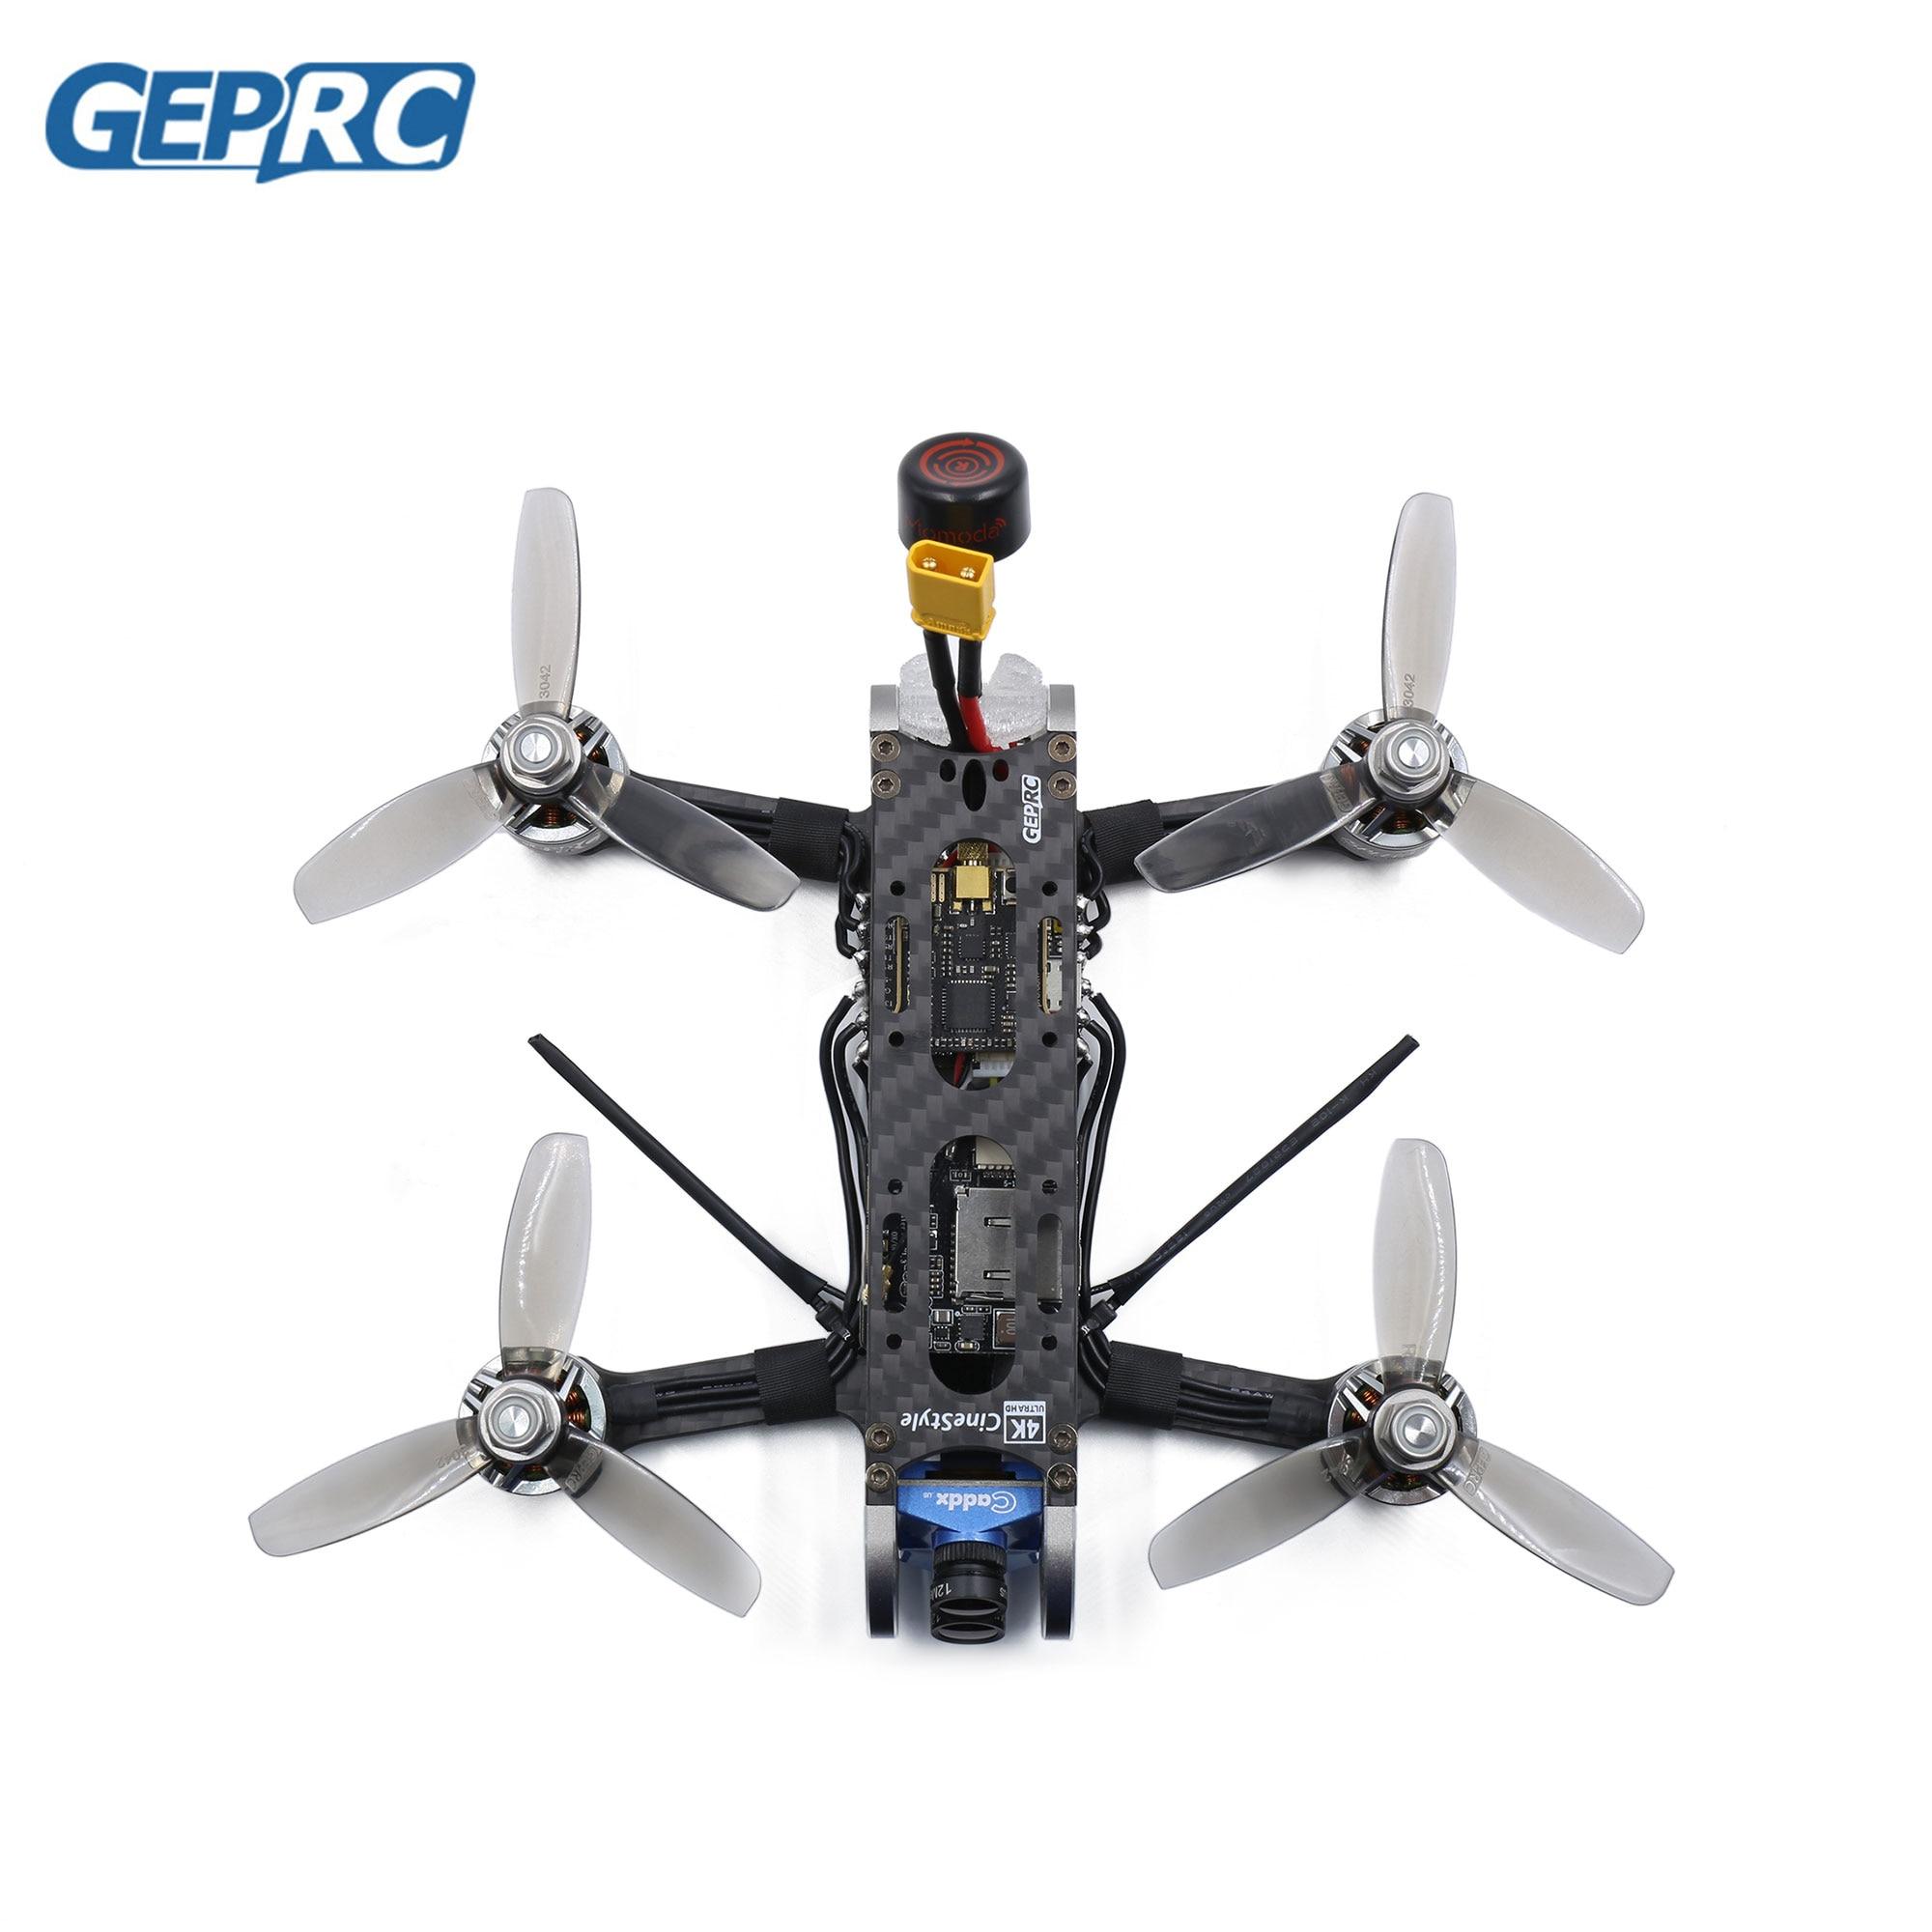 Image 5 - Geprc cinestyle 4 k v2 f7 듀얼 자이로 비행 컨트롤러 35a esc 1507 3600kv rc diy fpv 레이싱 무인 항공기 용 브러시리스 모터부품 & 액세서리   -